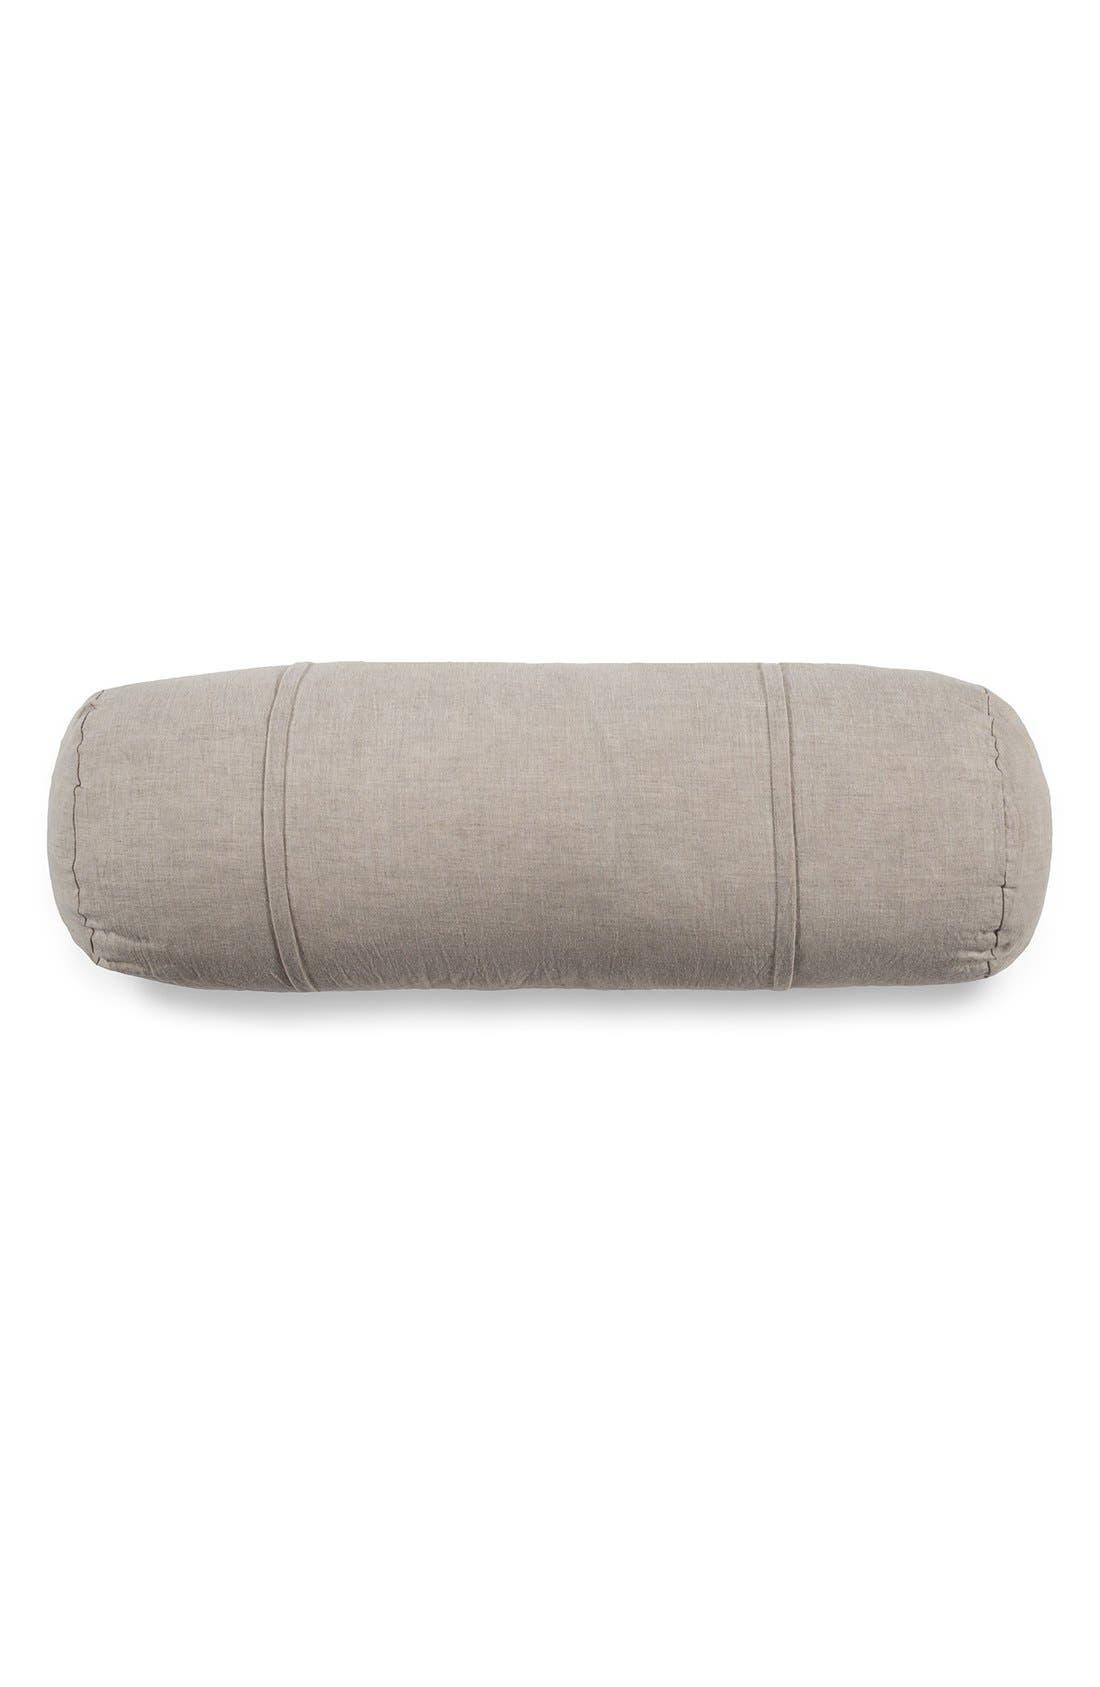 PomPomat Home 'Louwie' Bolster Pillow